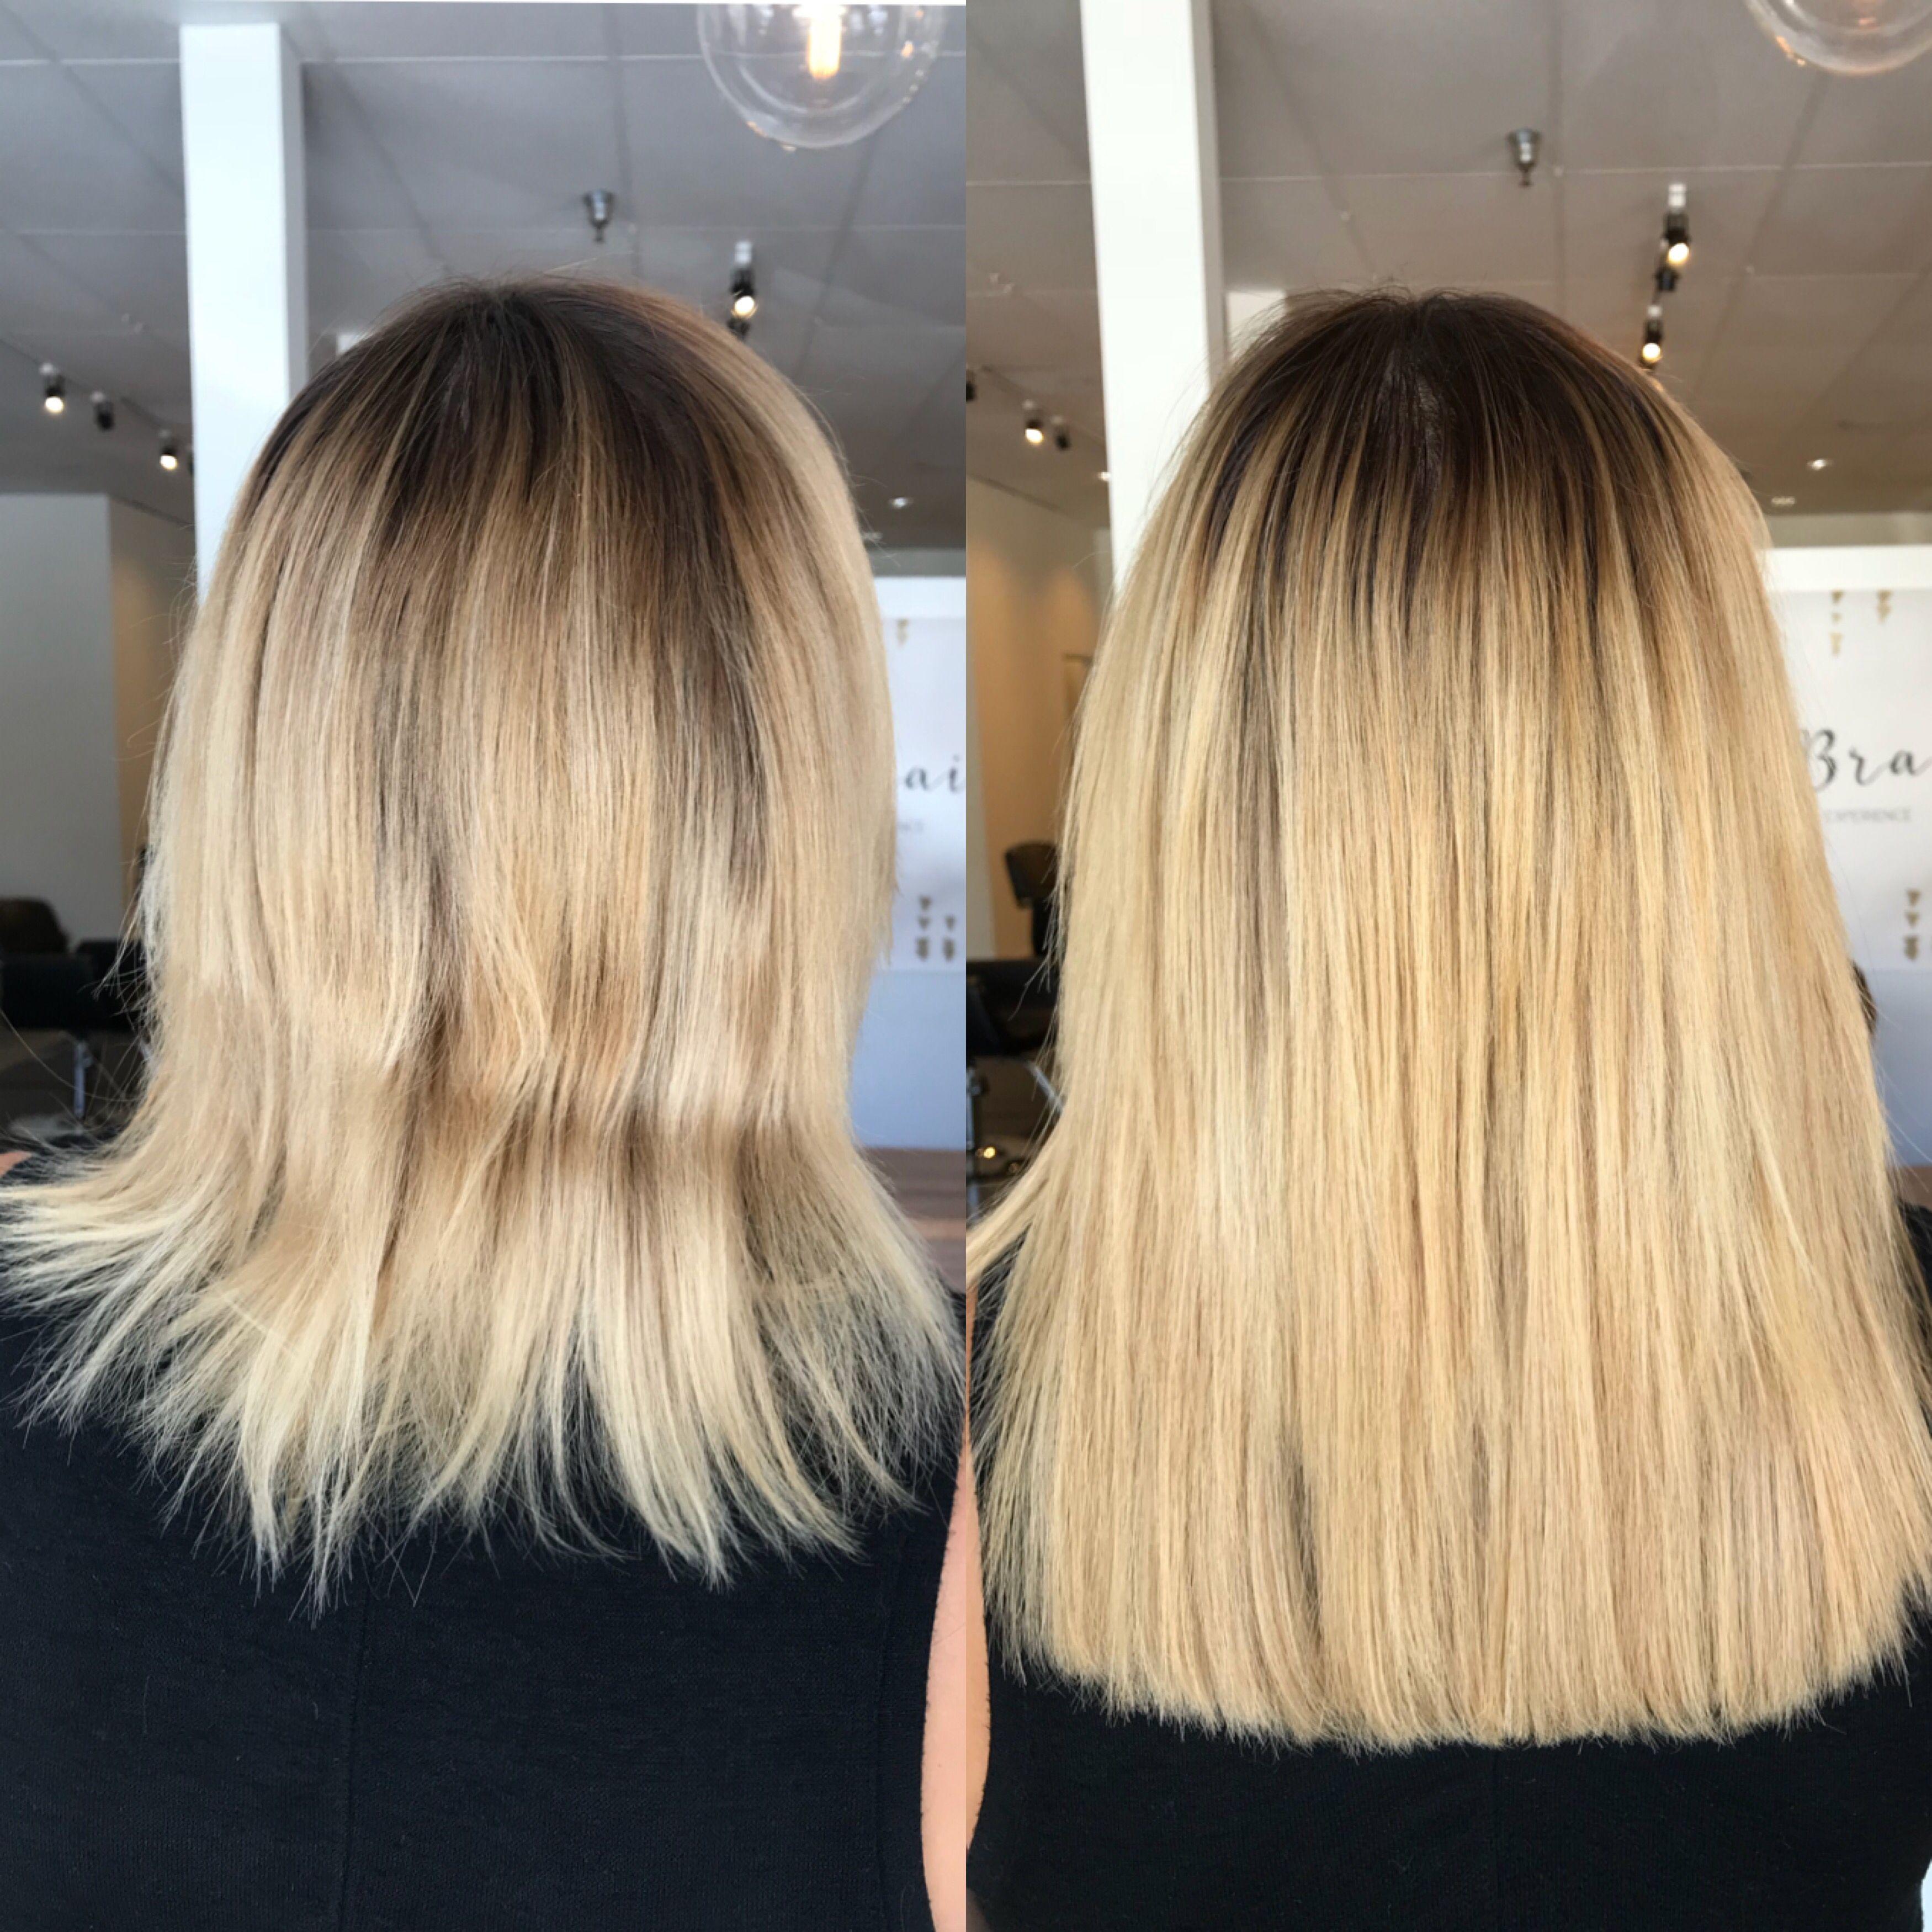 Hair Extensions Transformation Hair Extensions Hair Long Hair Styles